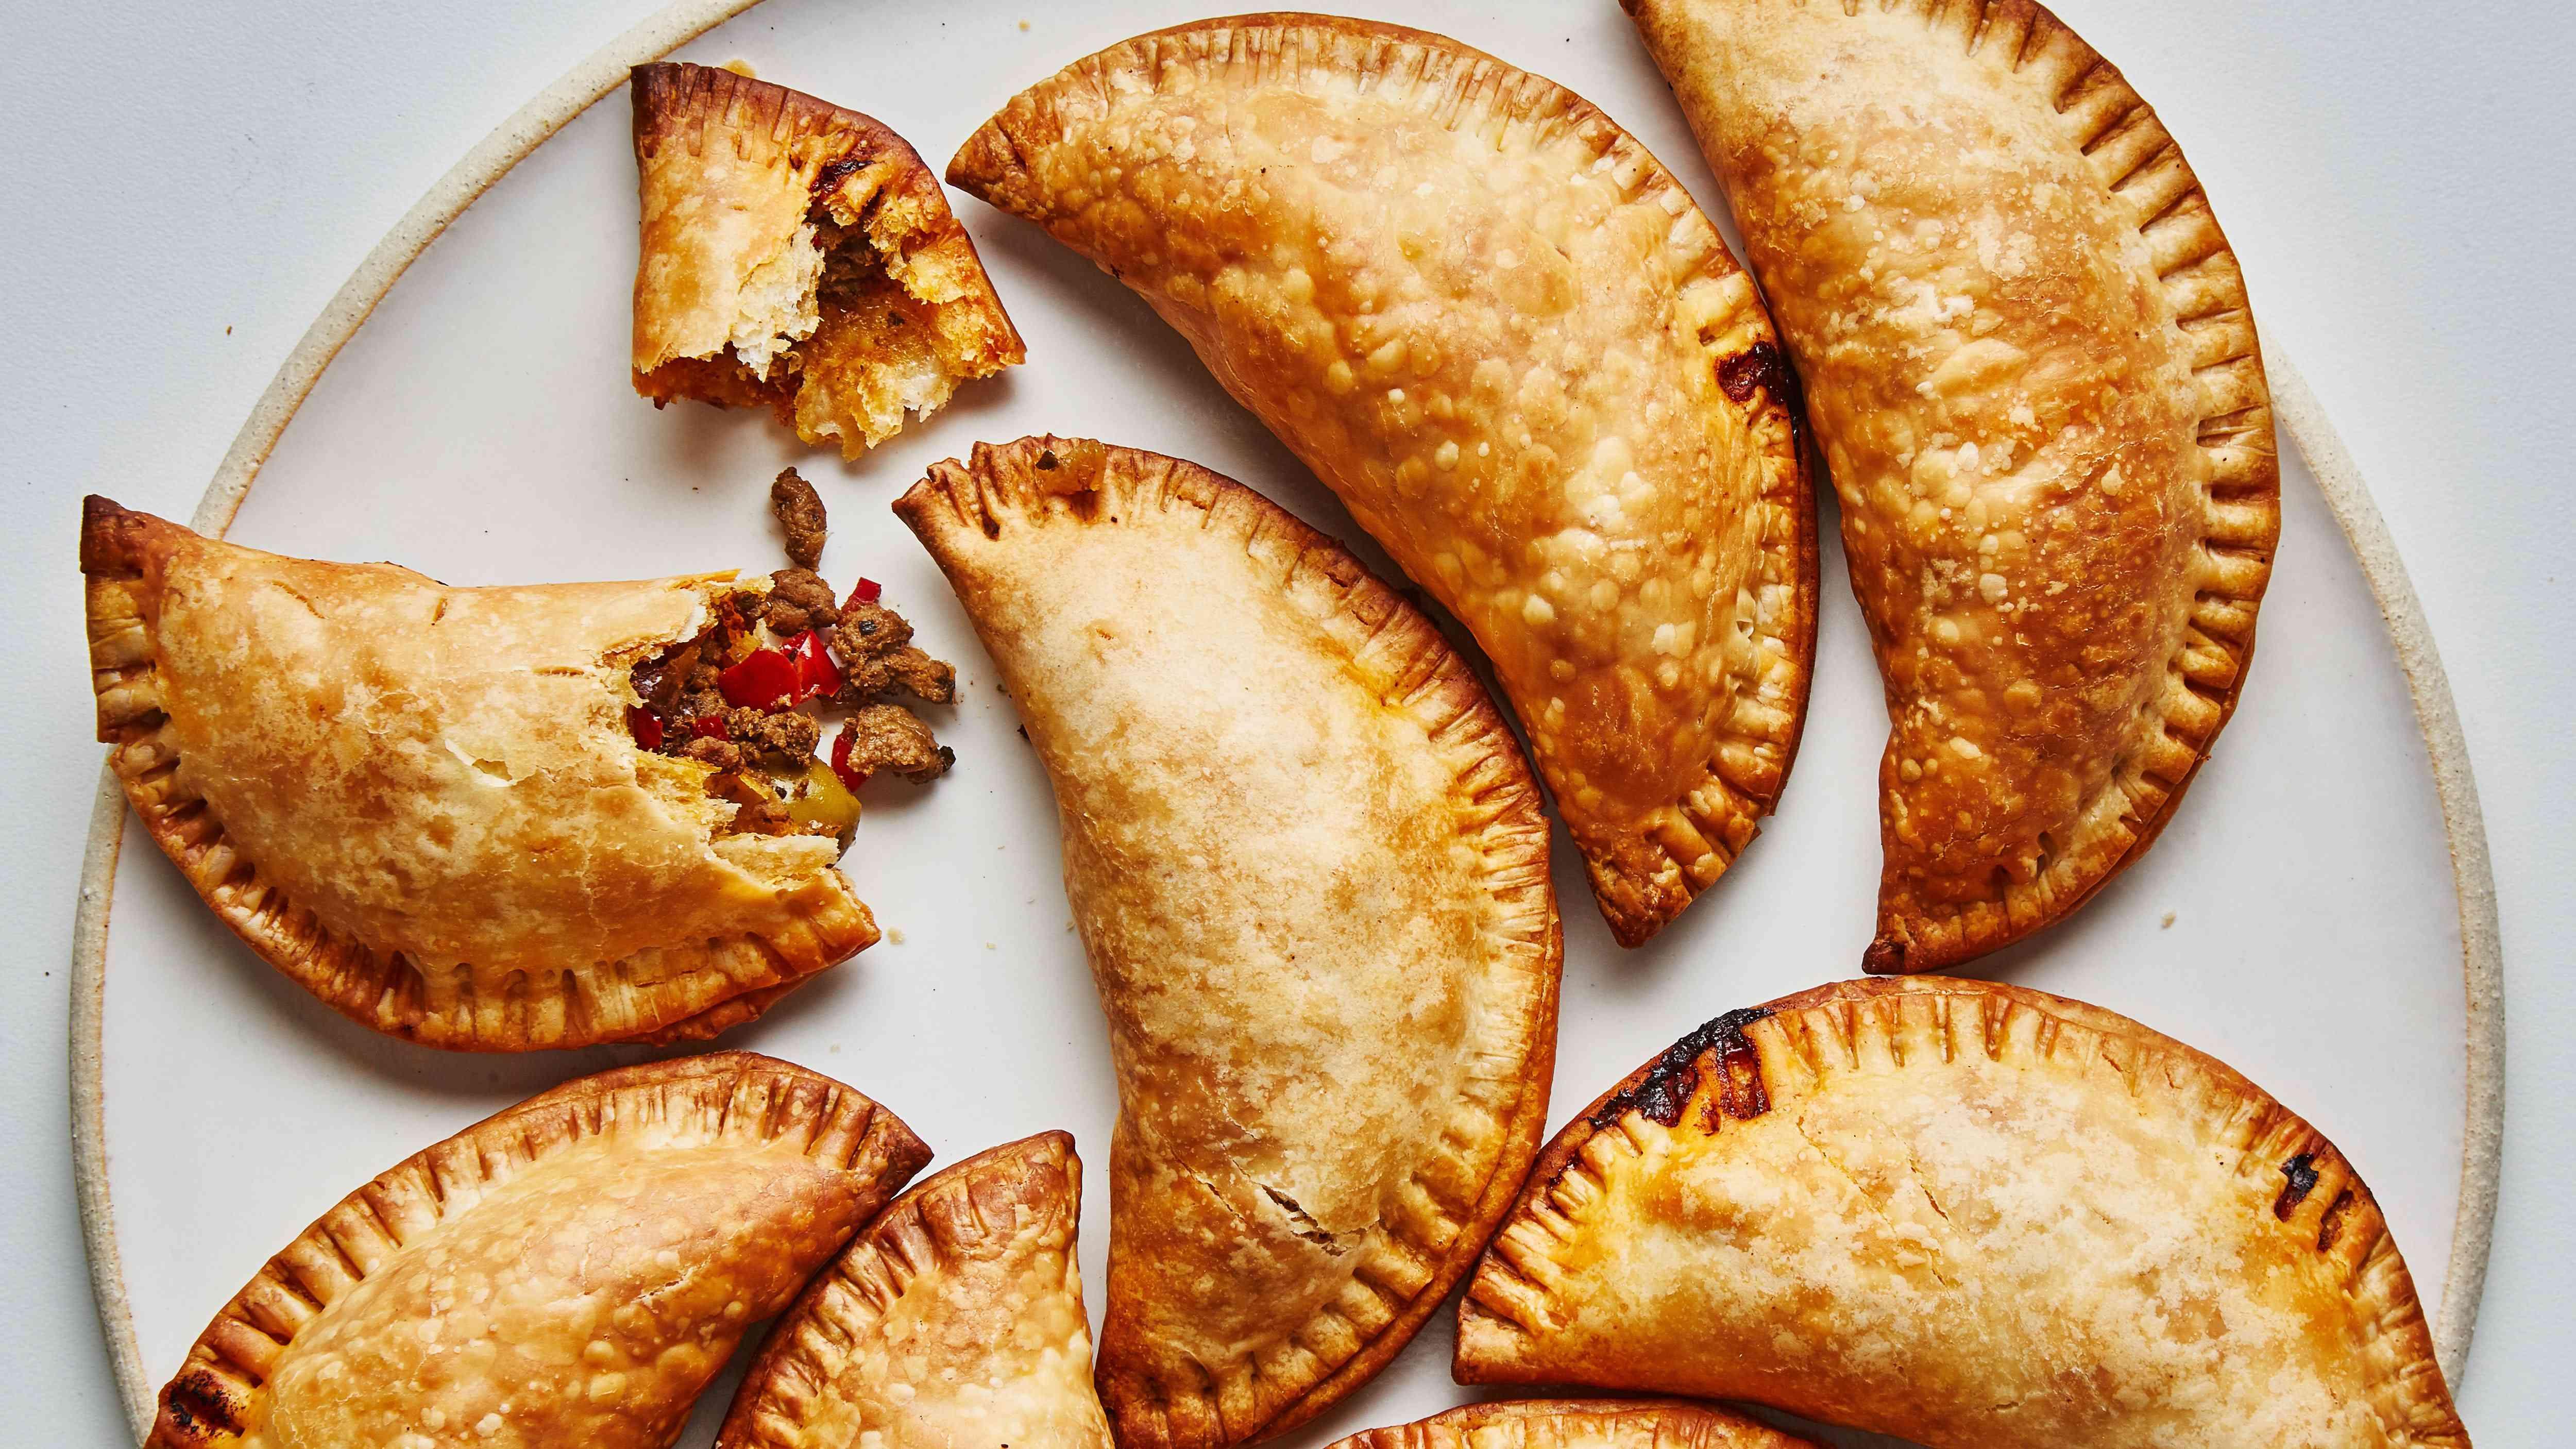 appetizers, hors d'oeuvres, food, reception, menu, hispanic food, latin food